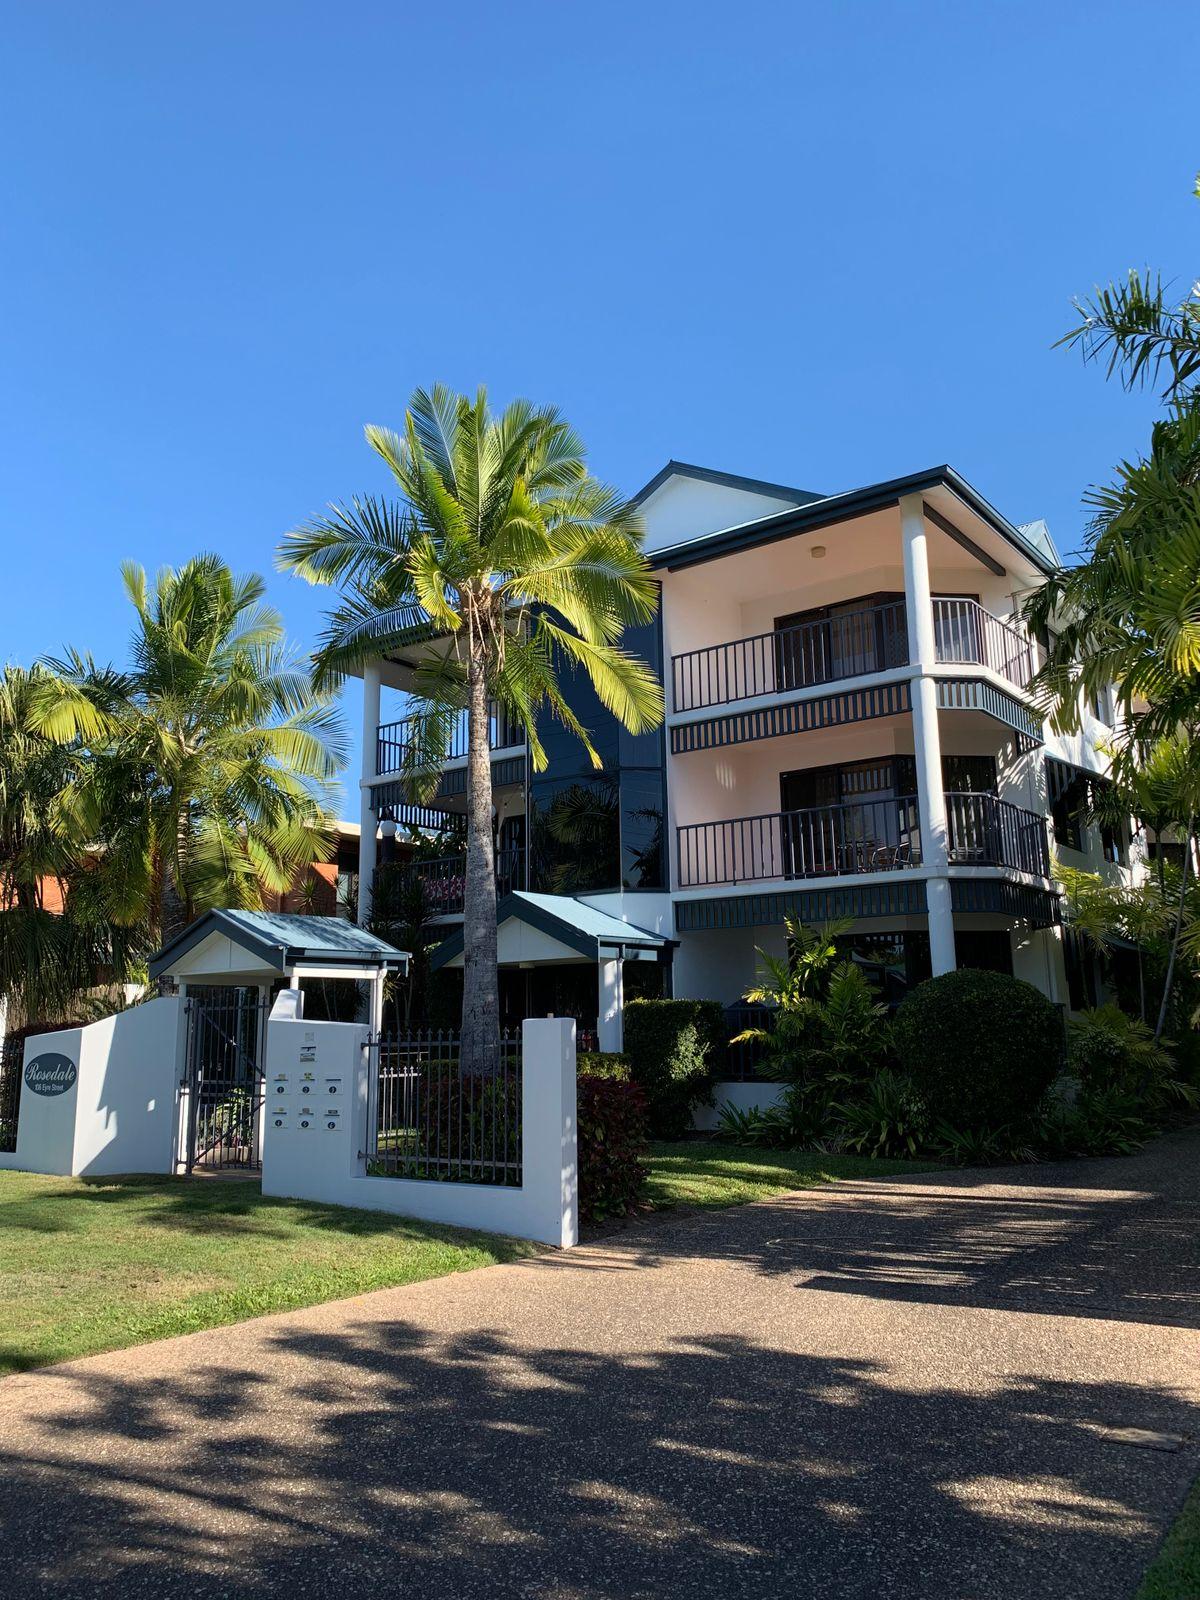 5/106 Eyre Street, North Ward, QLD 4810